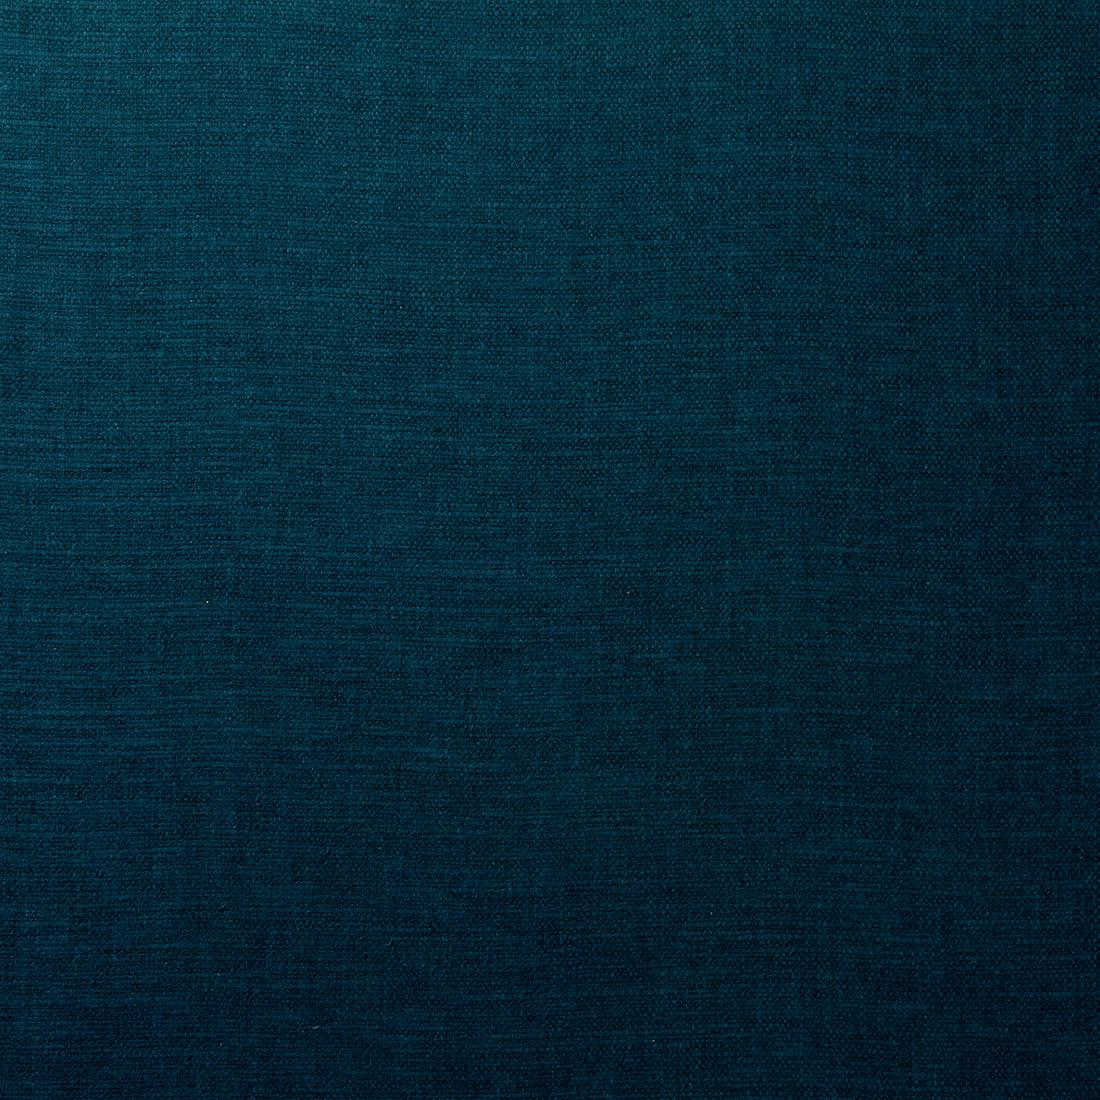 Lunar Indigo Upholstery Fabric